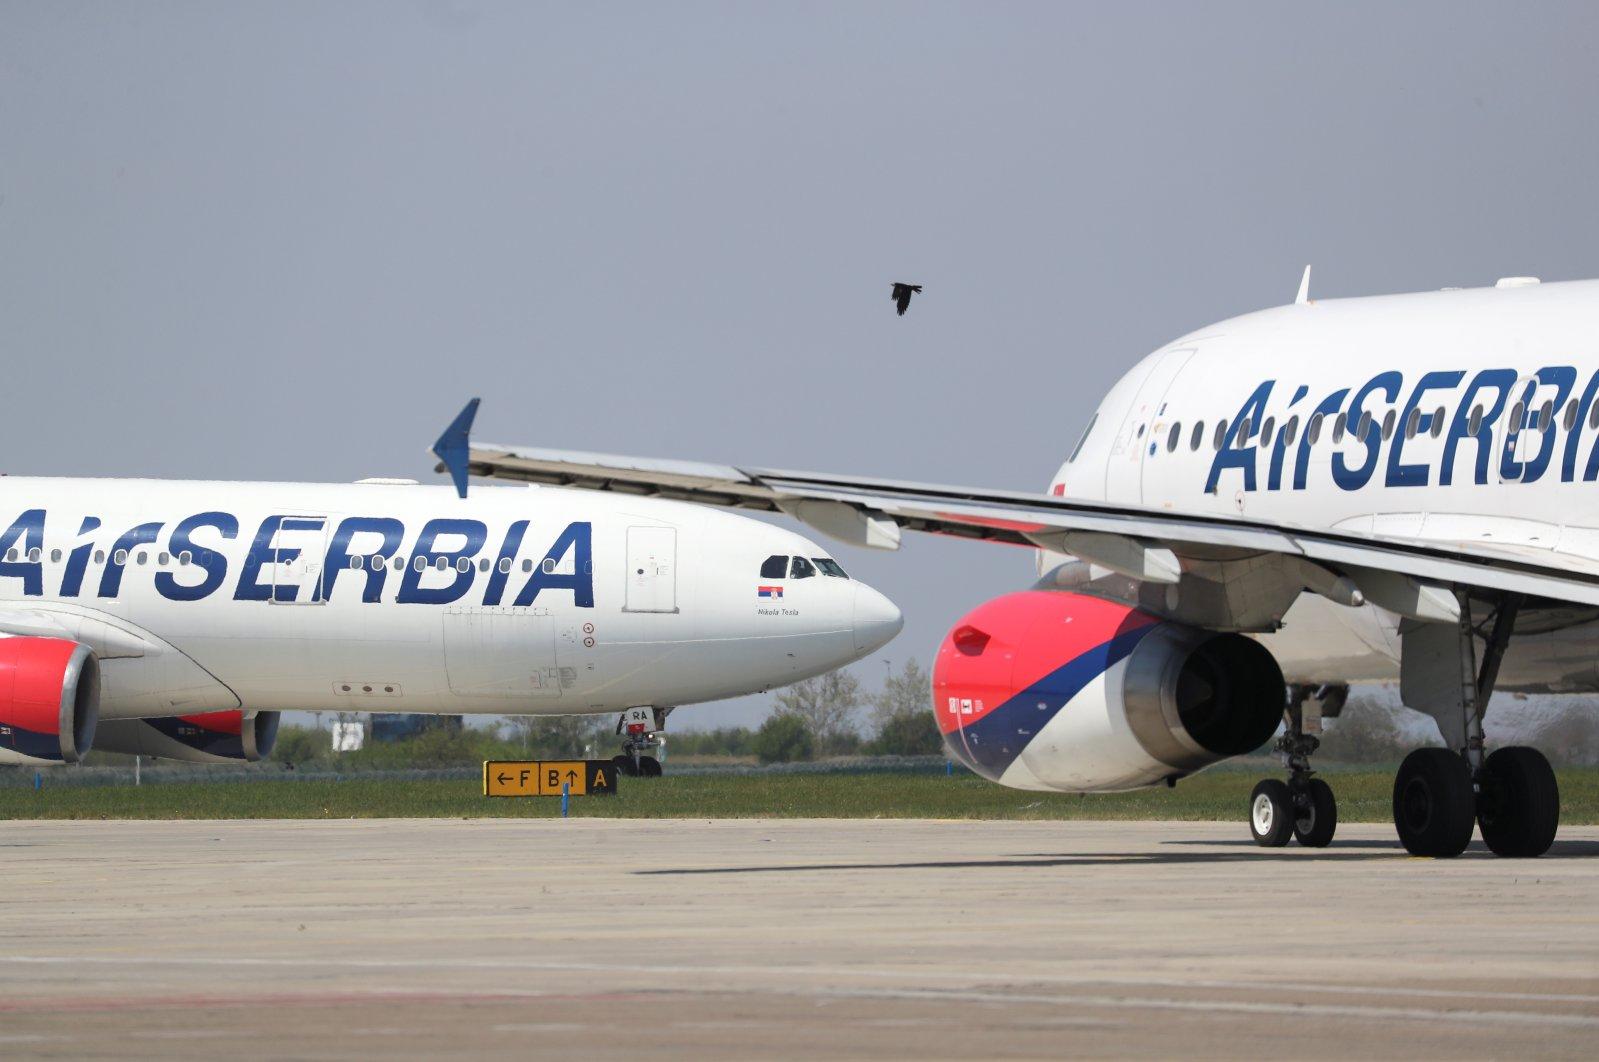 Air Serbia planes are seen at Nikola Tesla Airport, Belgrade, Serbia, April 25, 2020. (Reuters Photo)